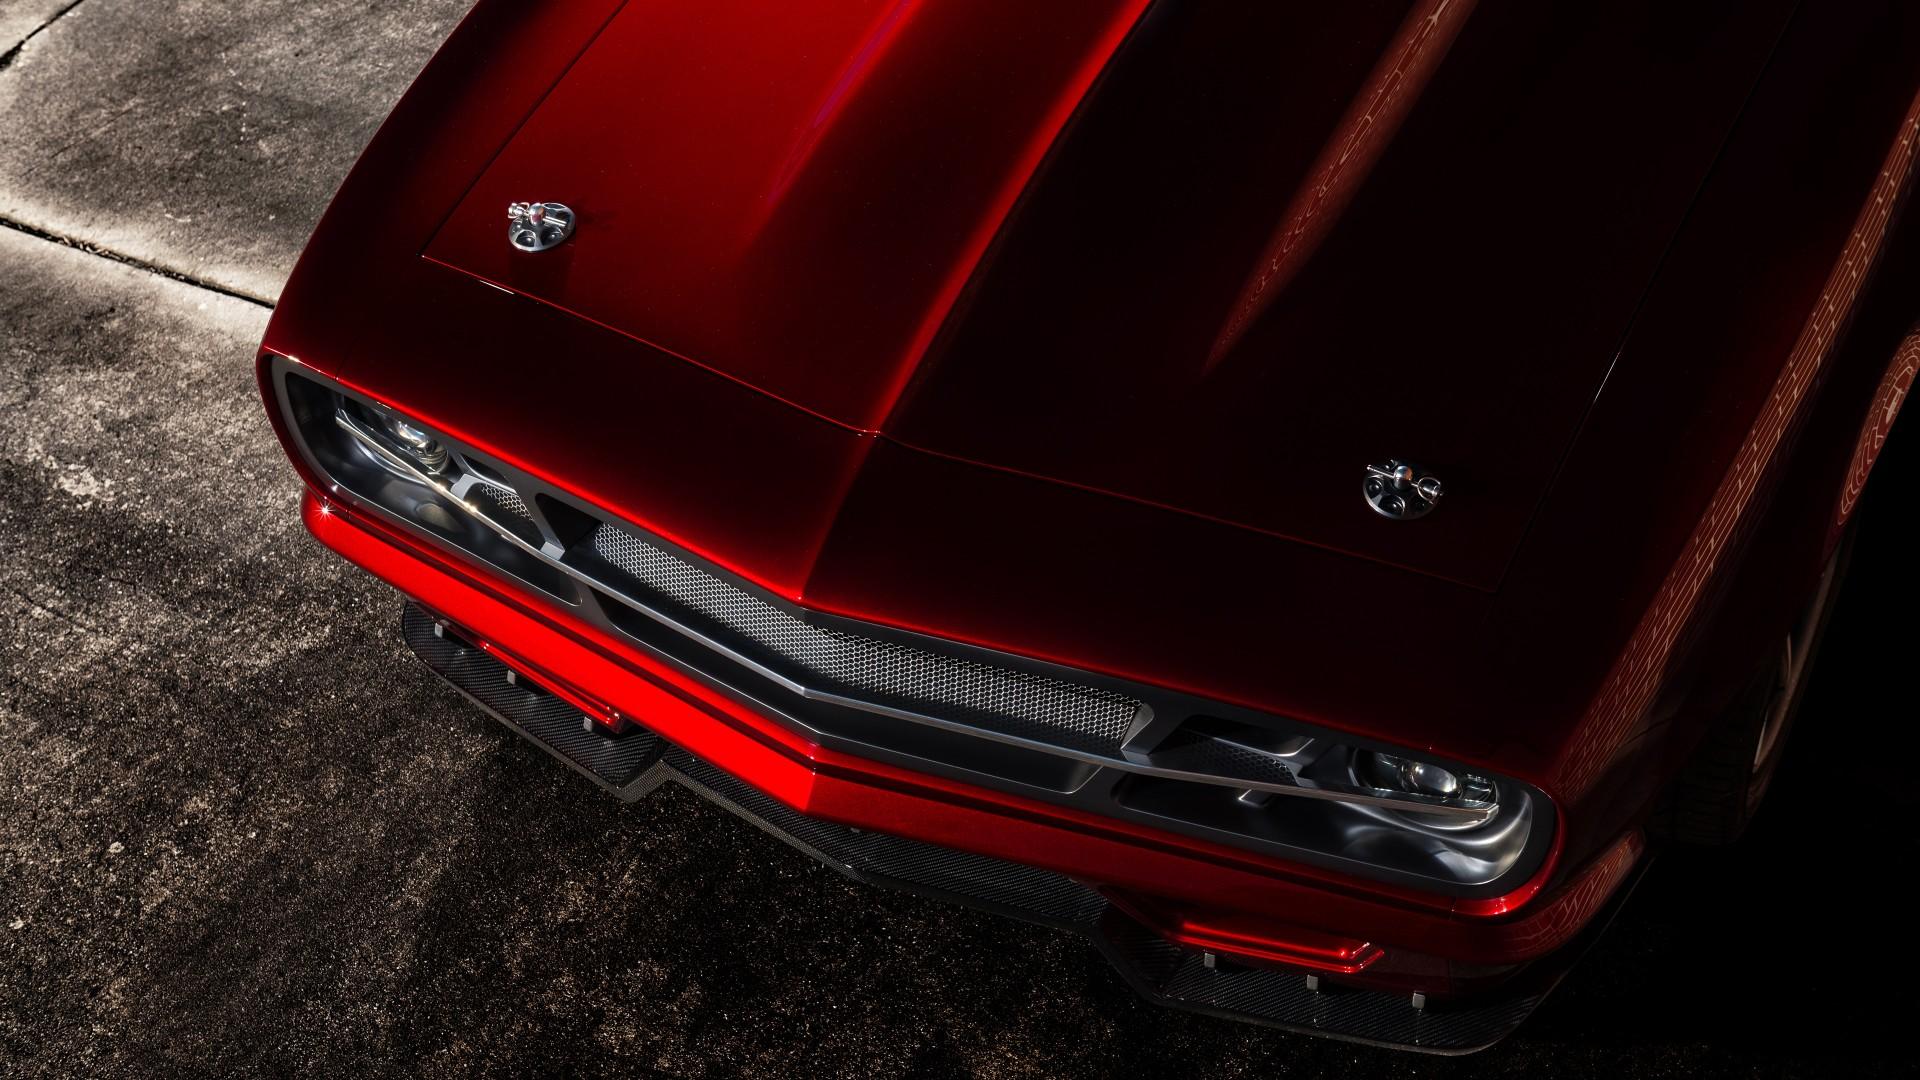 American Muscle Camaro Wallpaper | HD Car Wallpapers | ID